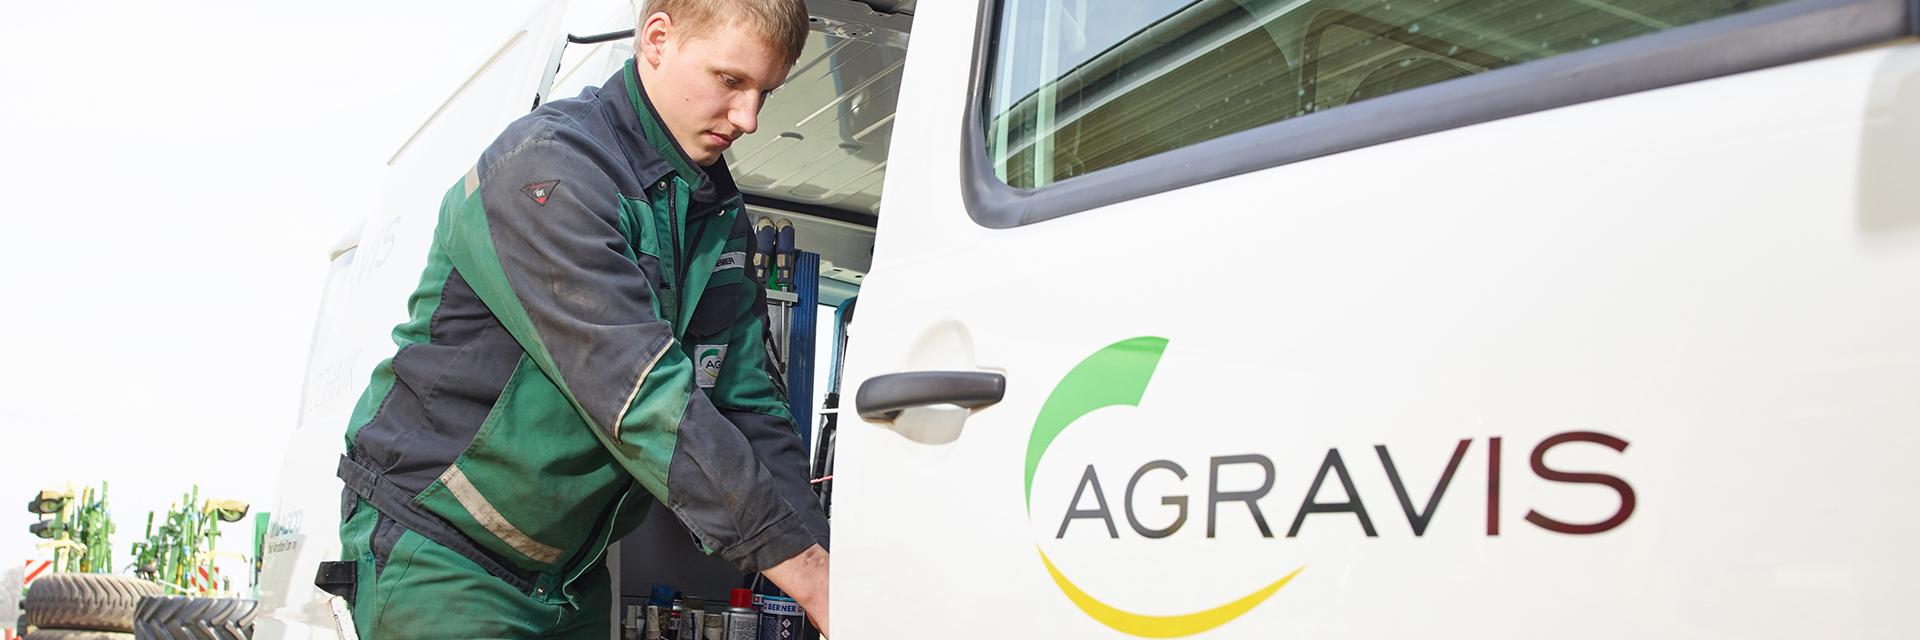 AGRAVIS Service vor Ort